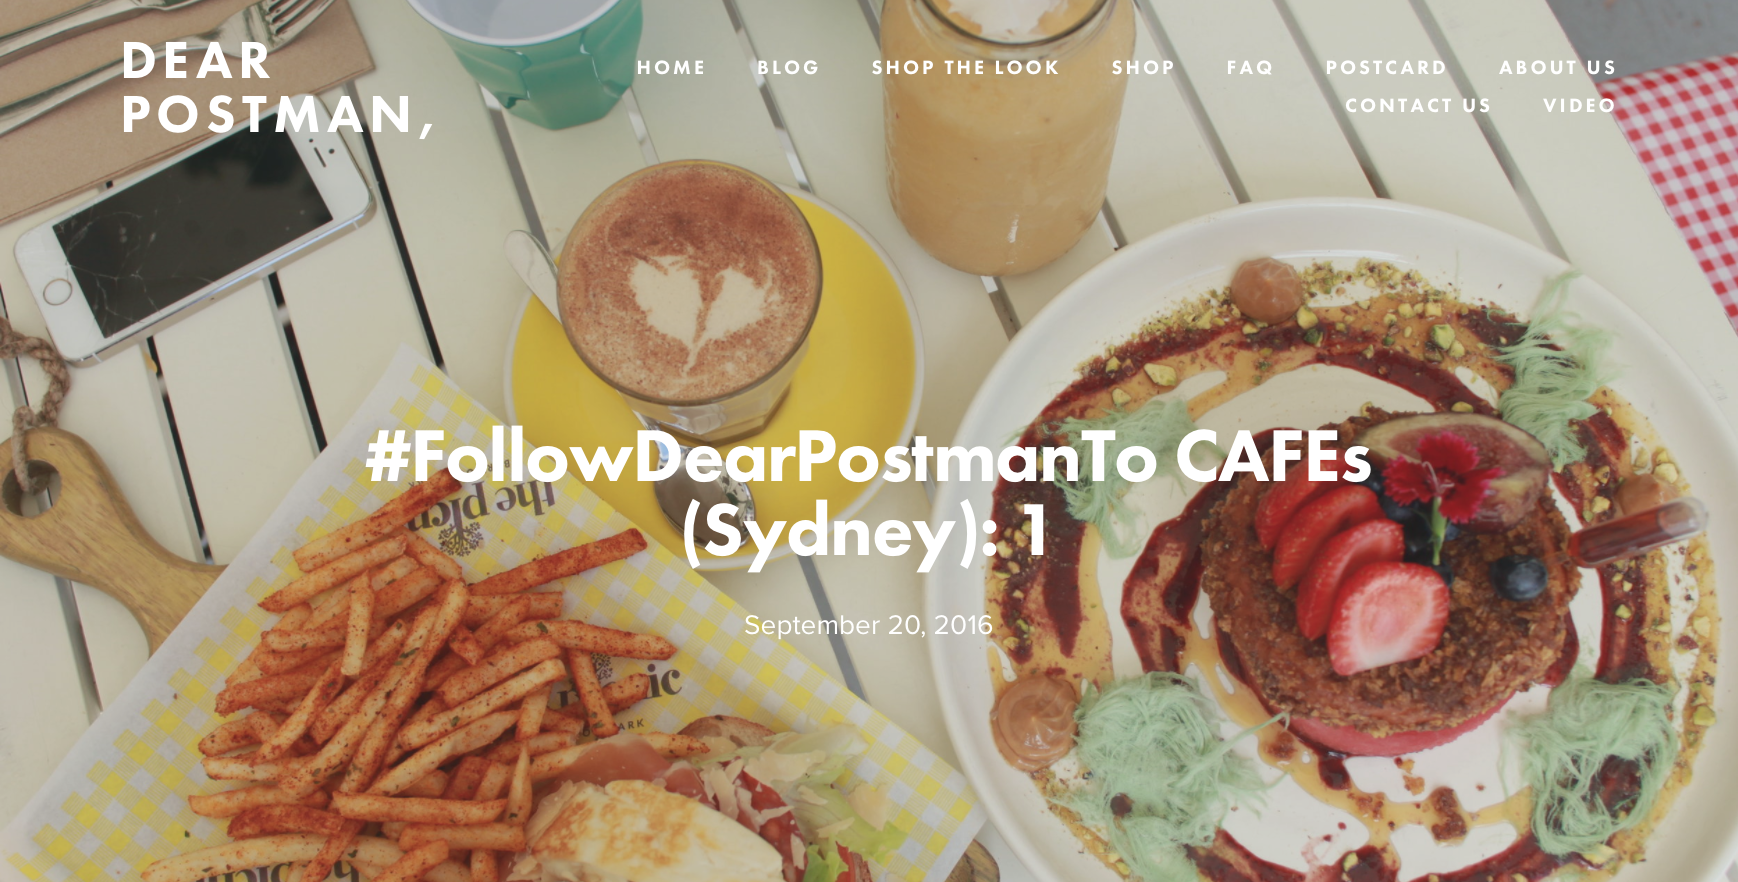 #FollowDearPostmanToCAFEs (Sydney): 1